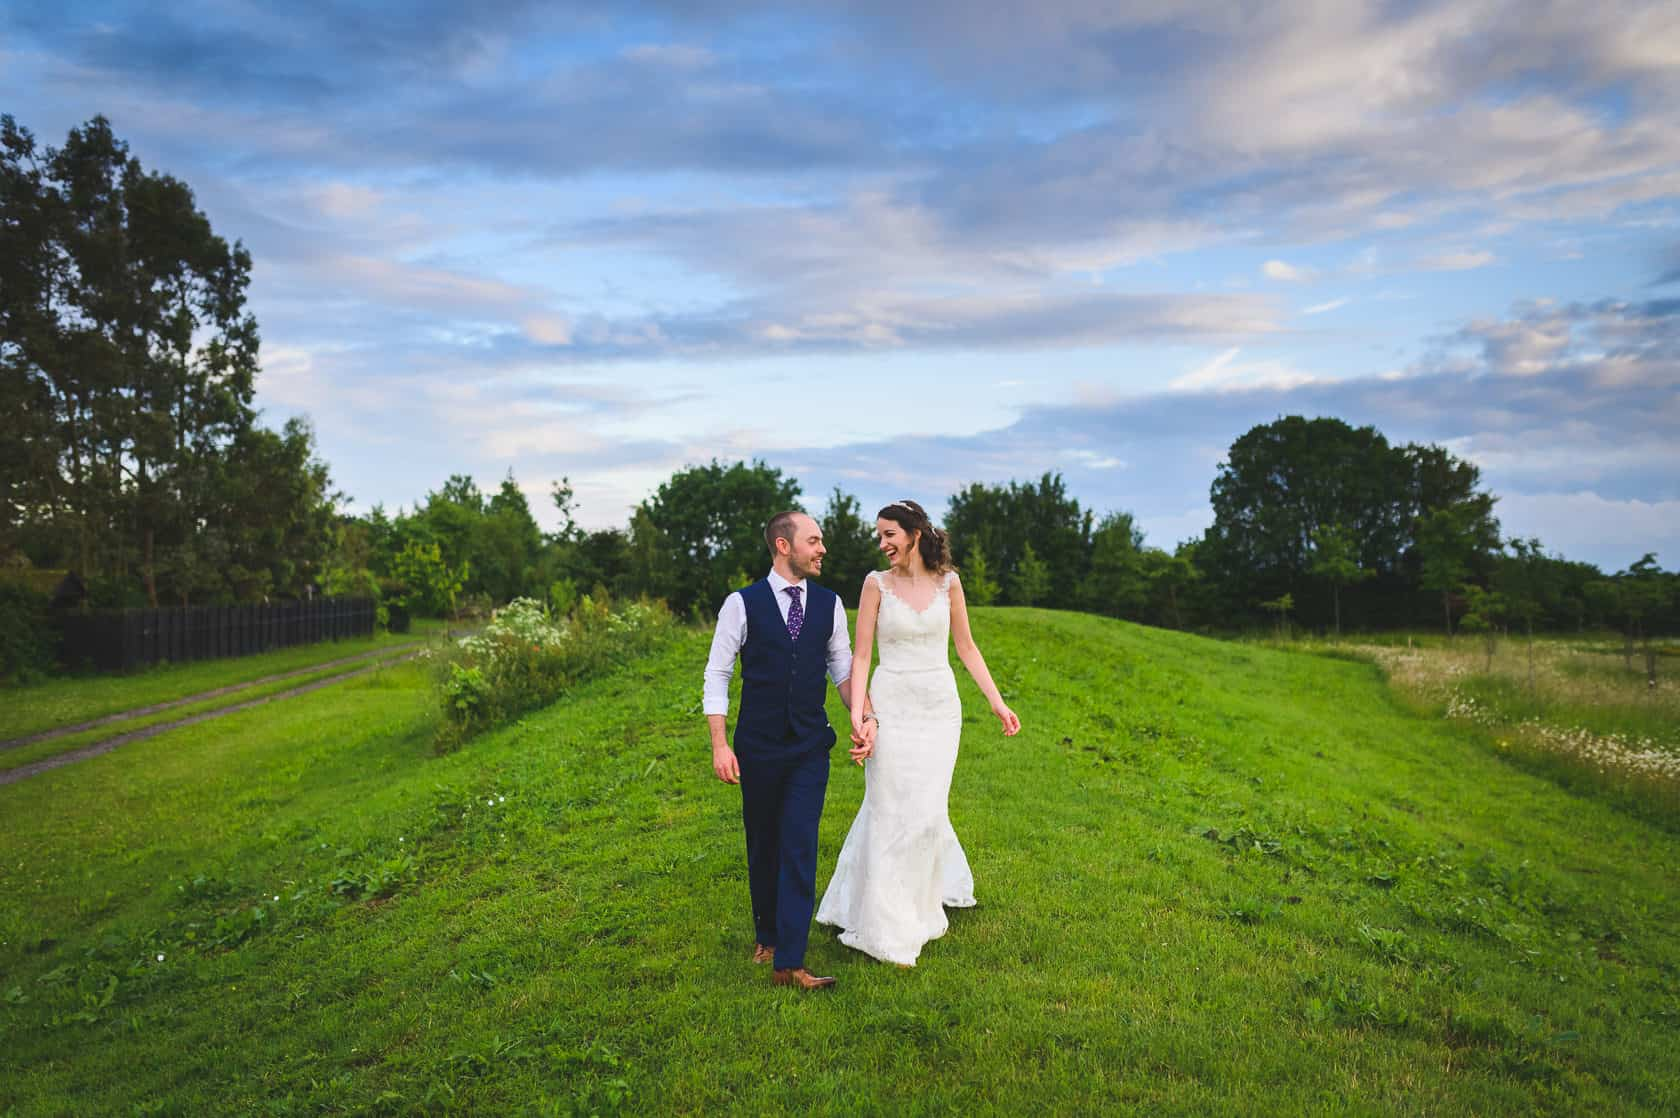 Best_Wedding_Photography_2019_Wedding-Photographer-Essex_021